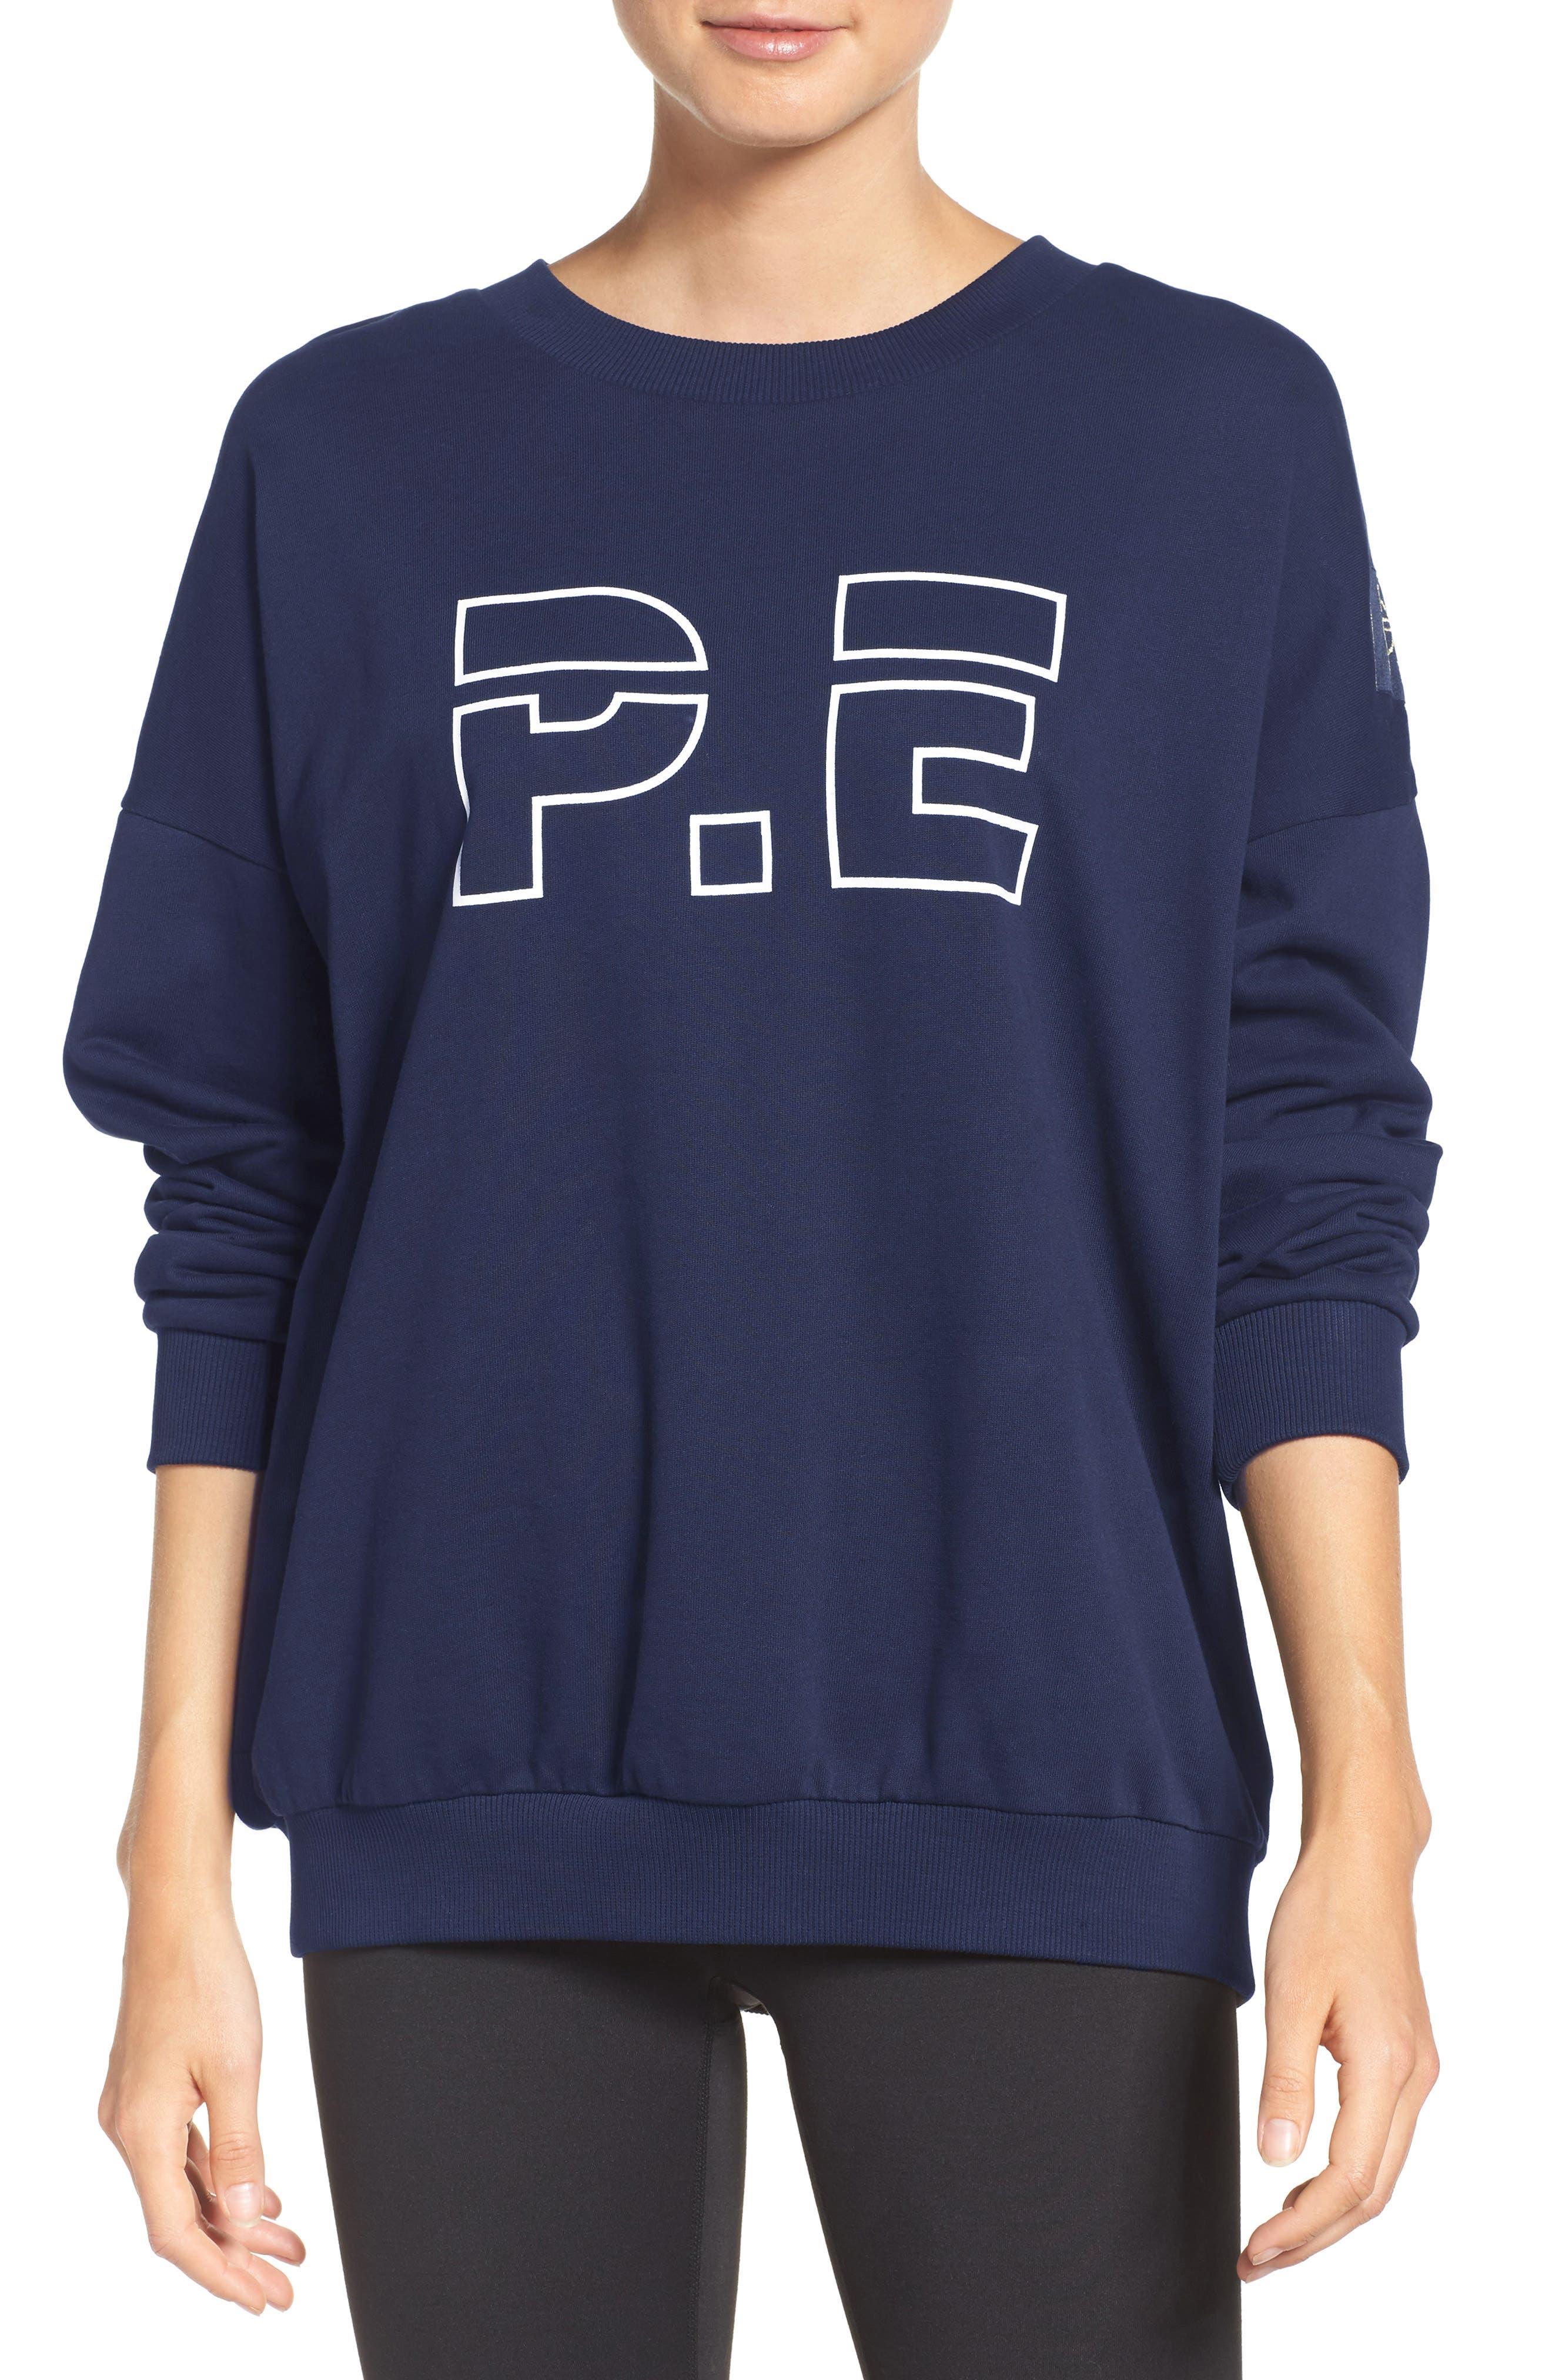 P.E. Nation The Heads Up Sweatshirt,                             Main thumbnail 1, color,                             410